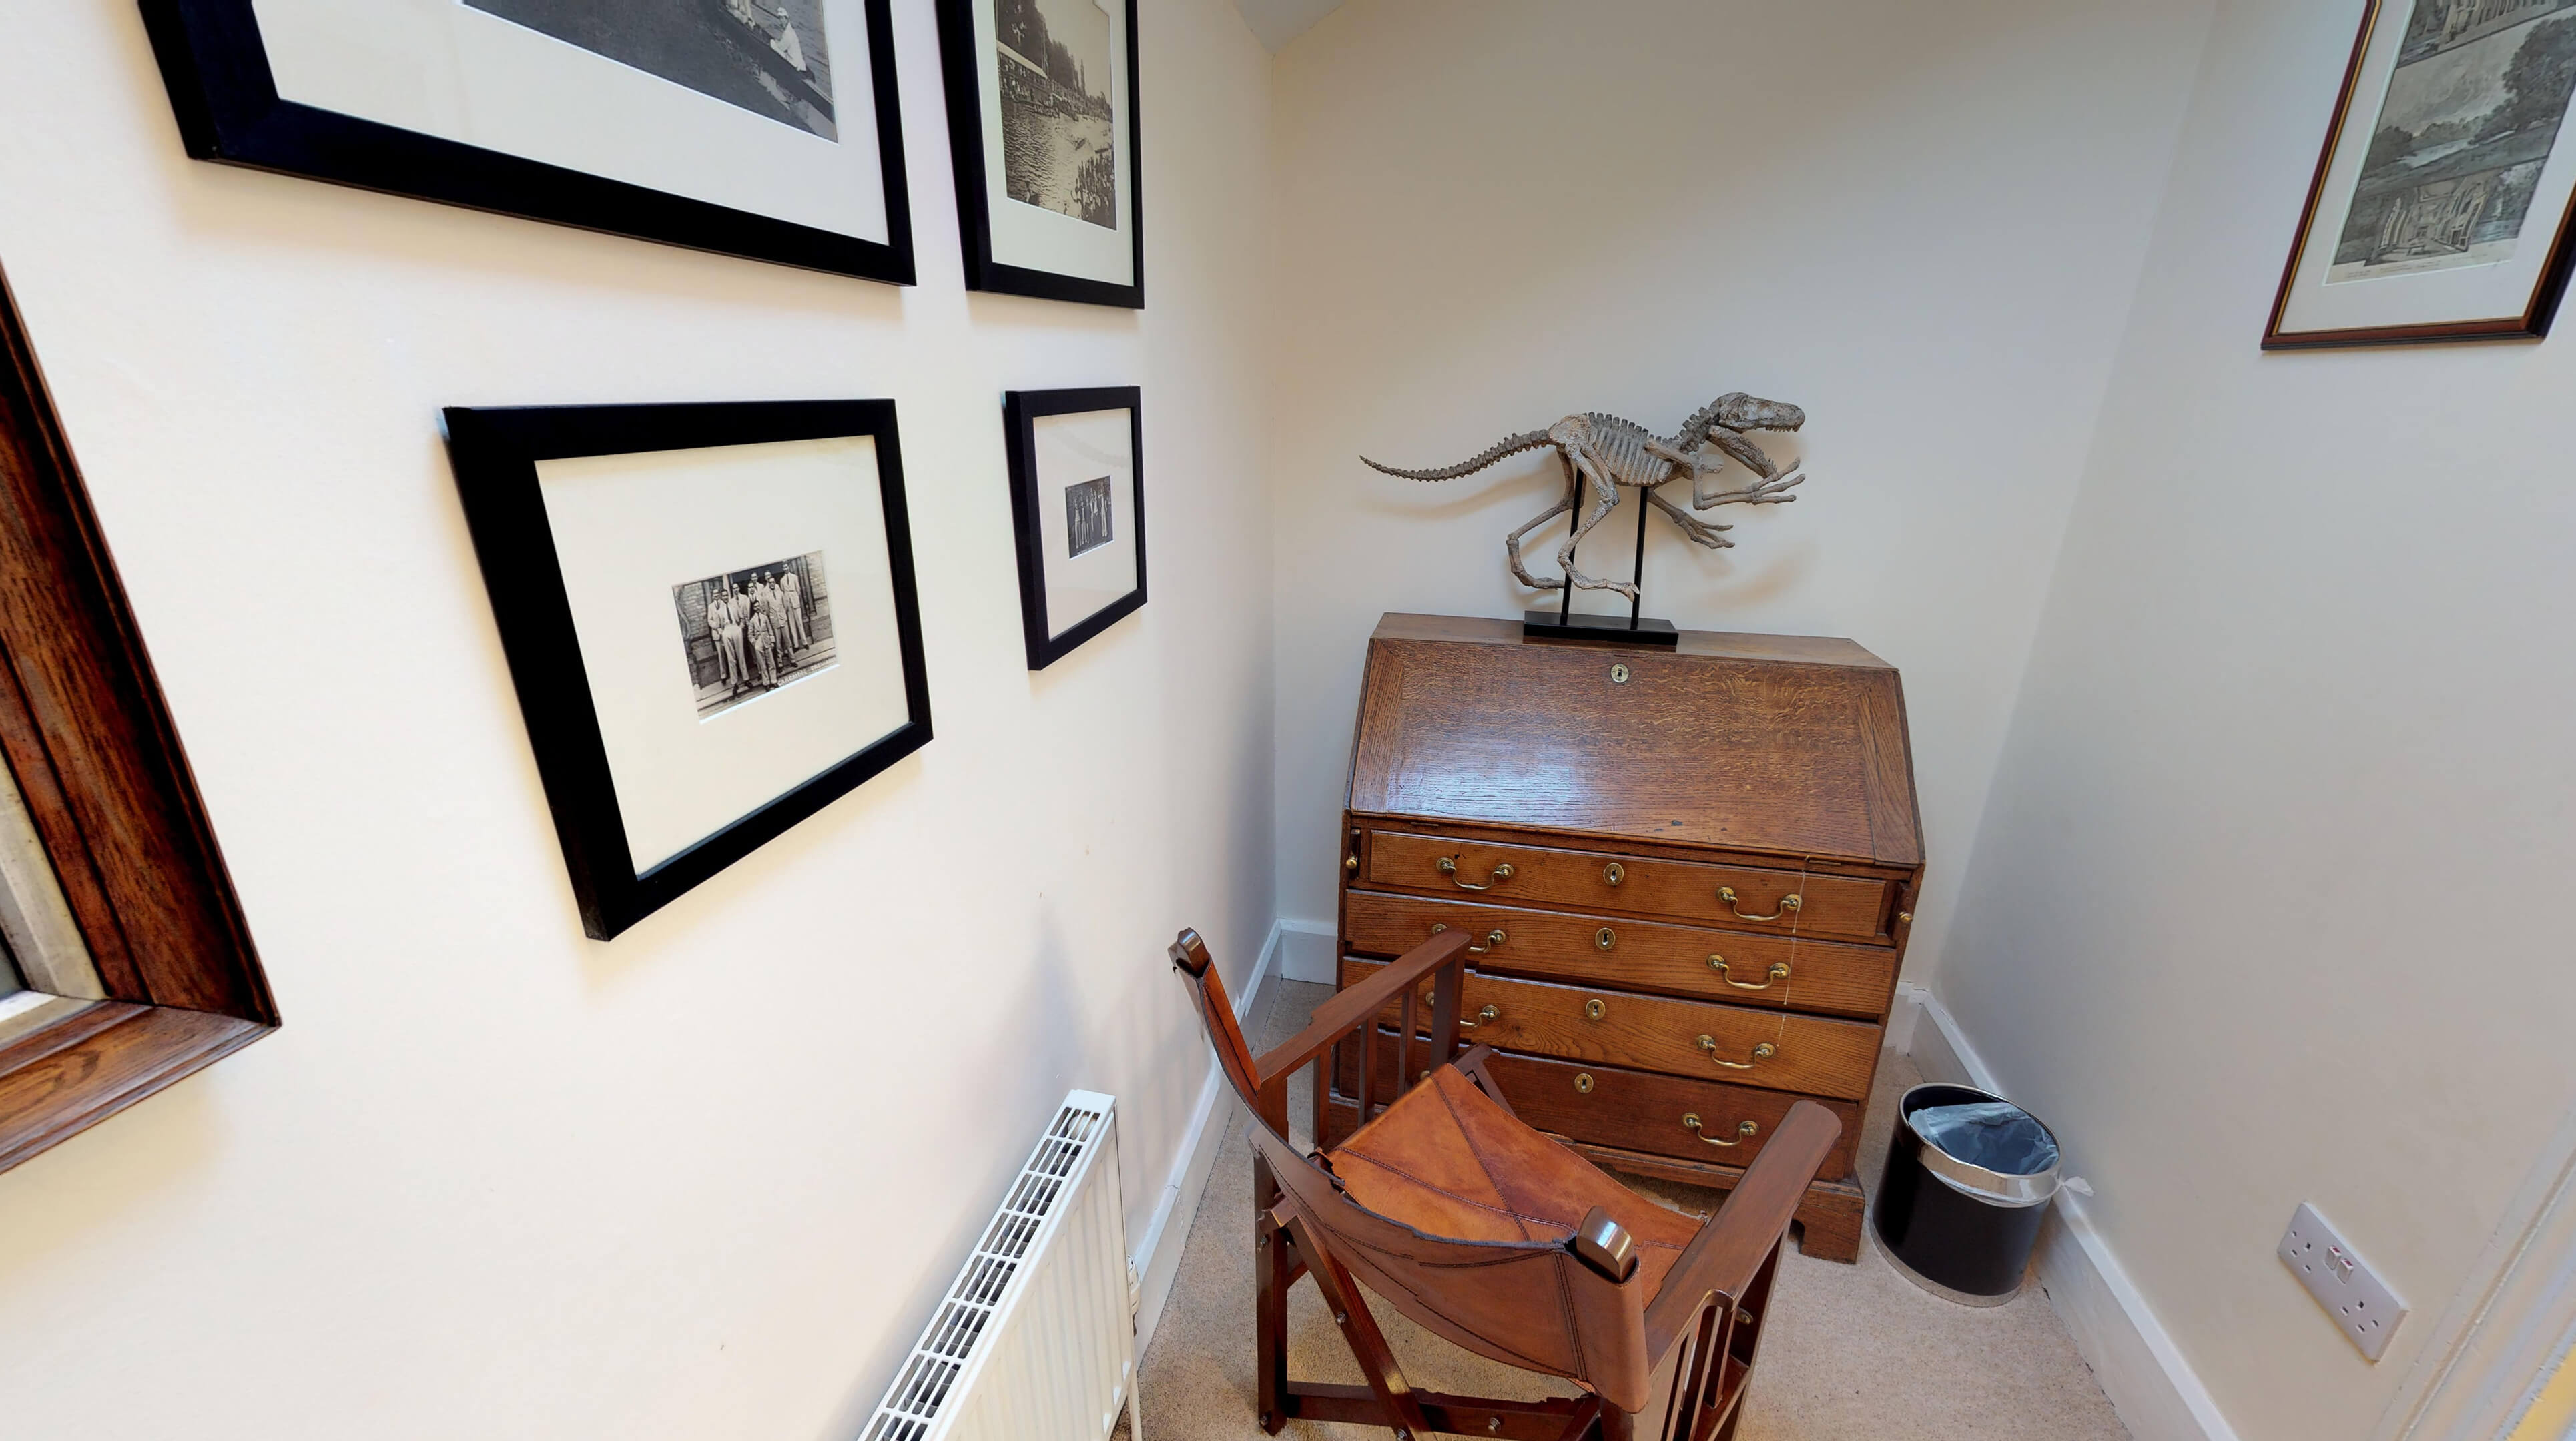 Bladon Two Bedroom Home Farm Cottage Study